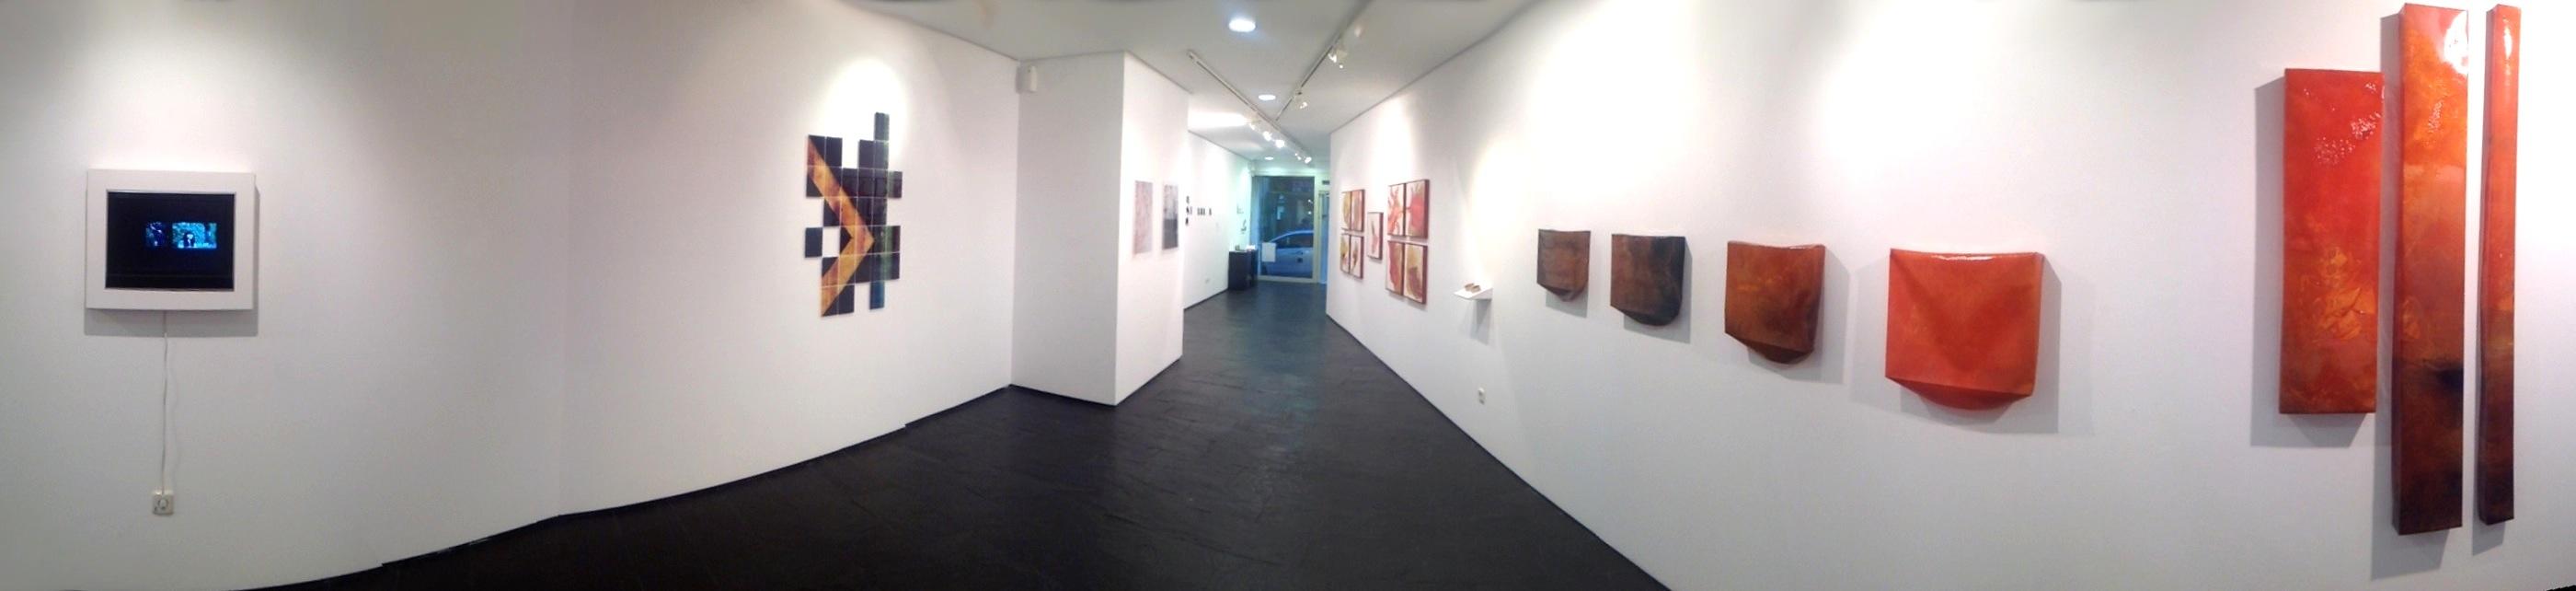 entrada3